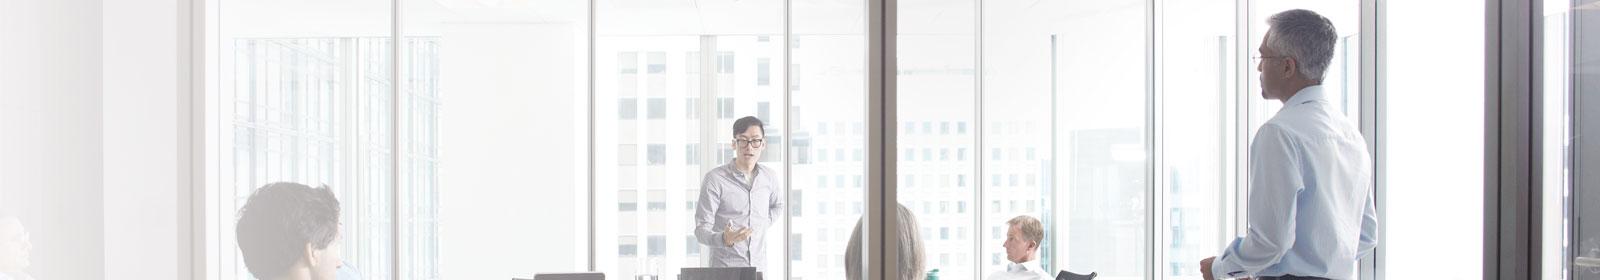 Man talks to his peers in a boardroom